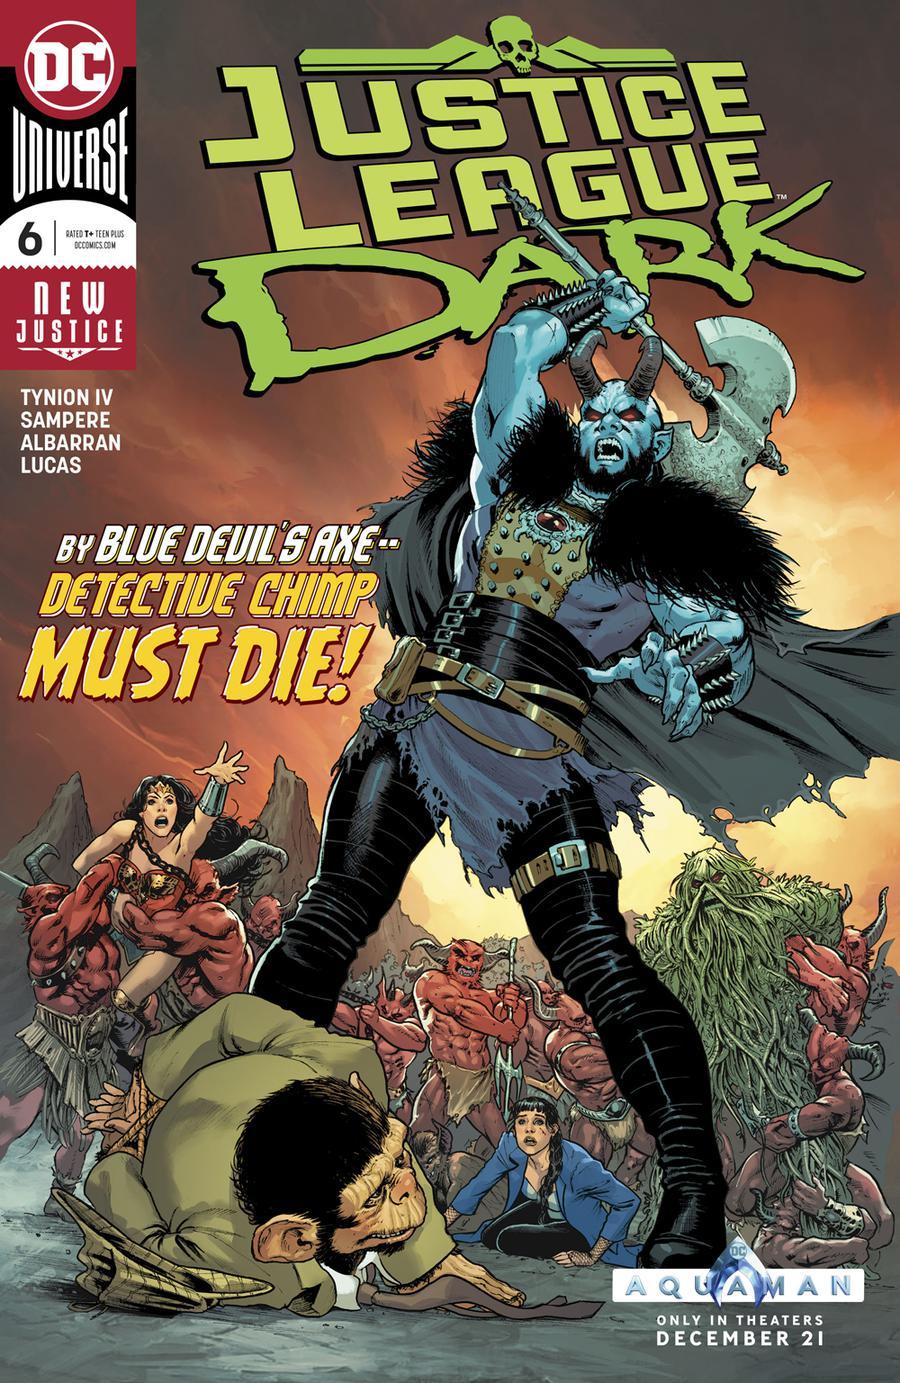 Justice League Dark Vol 2 #6 Cover A Regular Nicola Scott Cover